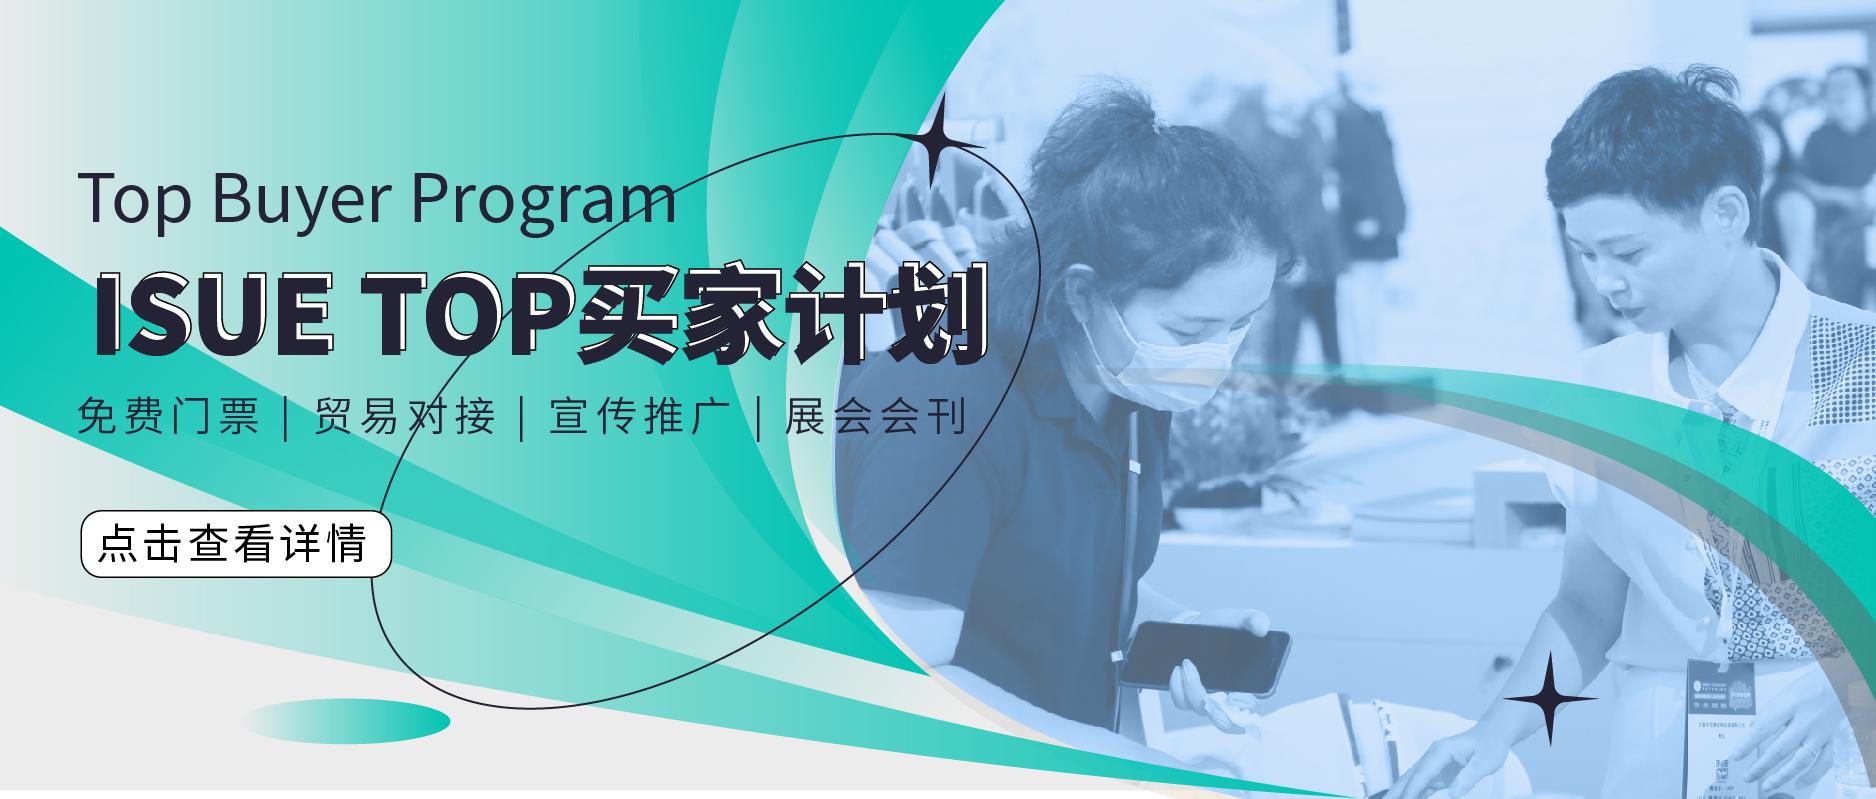 ISUE上海校服展组团参观买家计划:先人一步,洞察先机